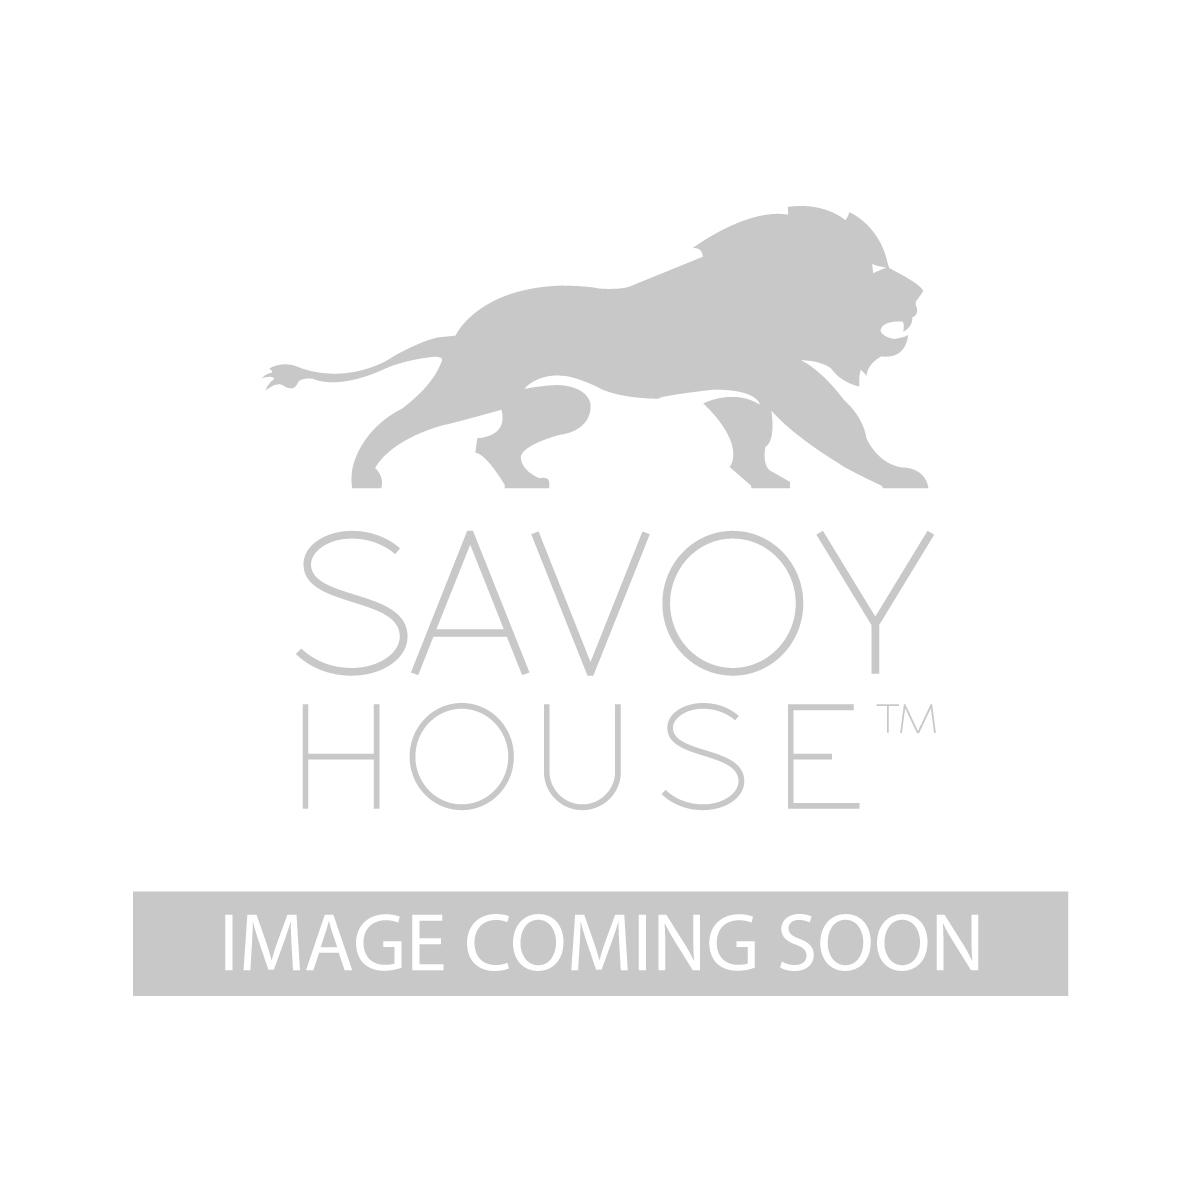 6p 7213 3 13 terrell 3 light semi flush by savoy house for Www savoyhouse com